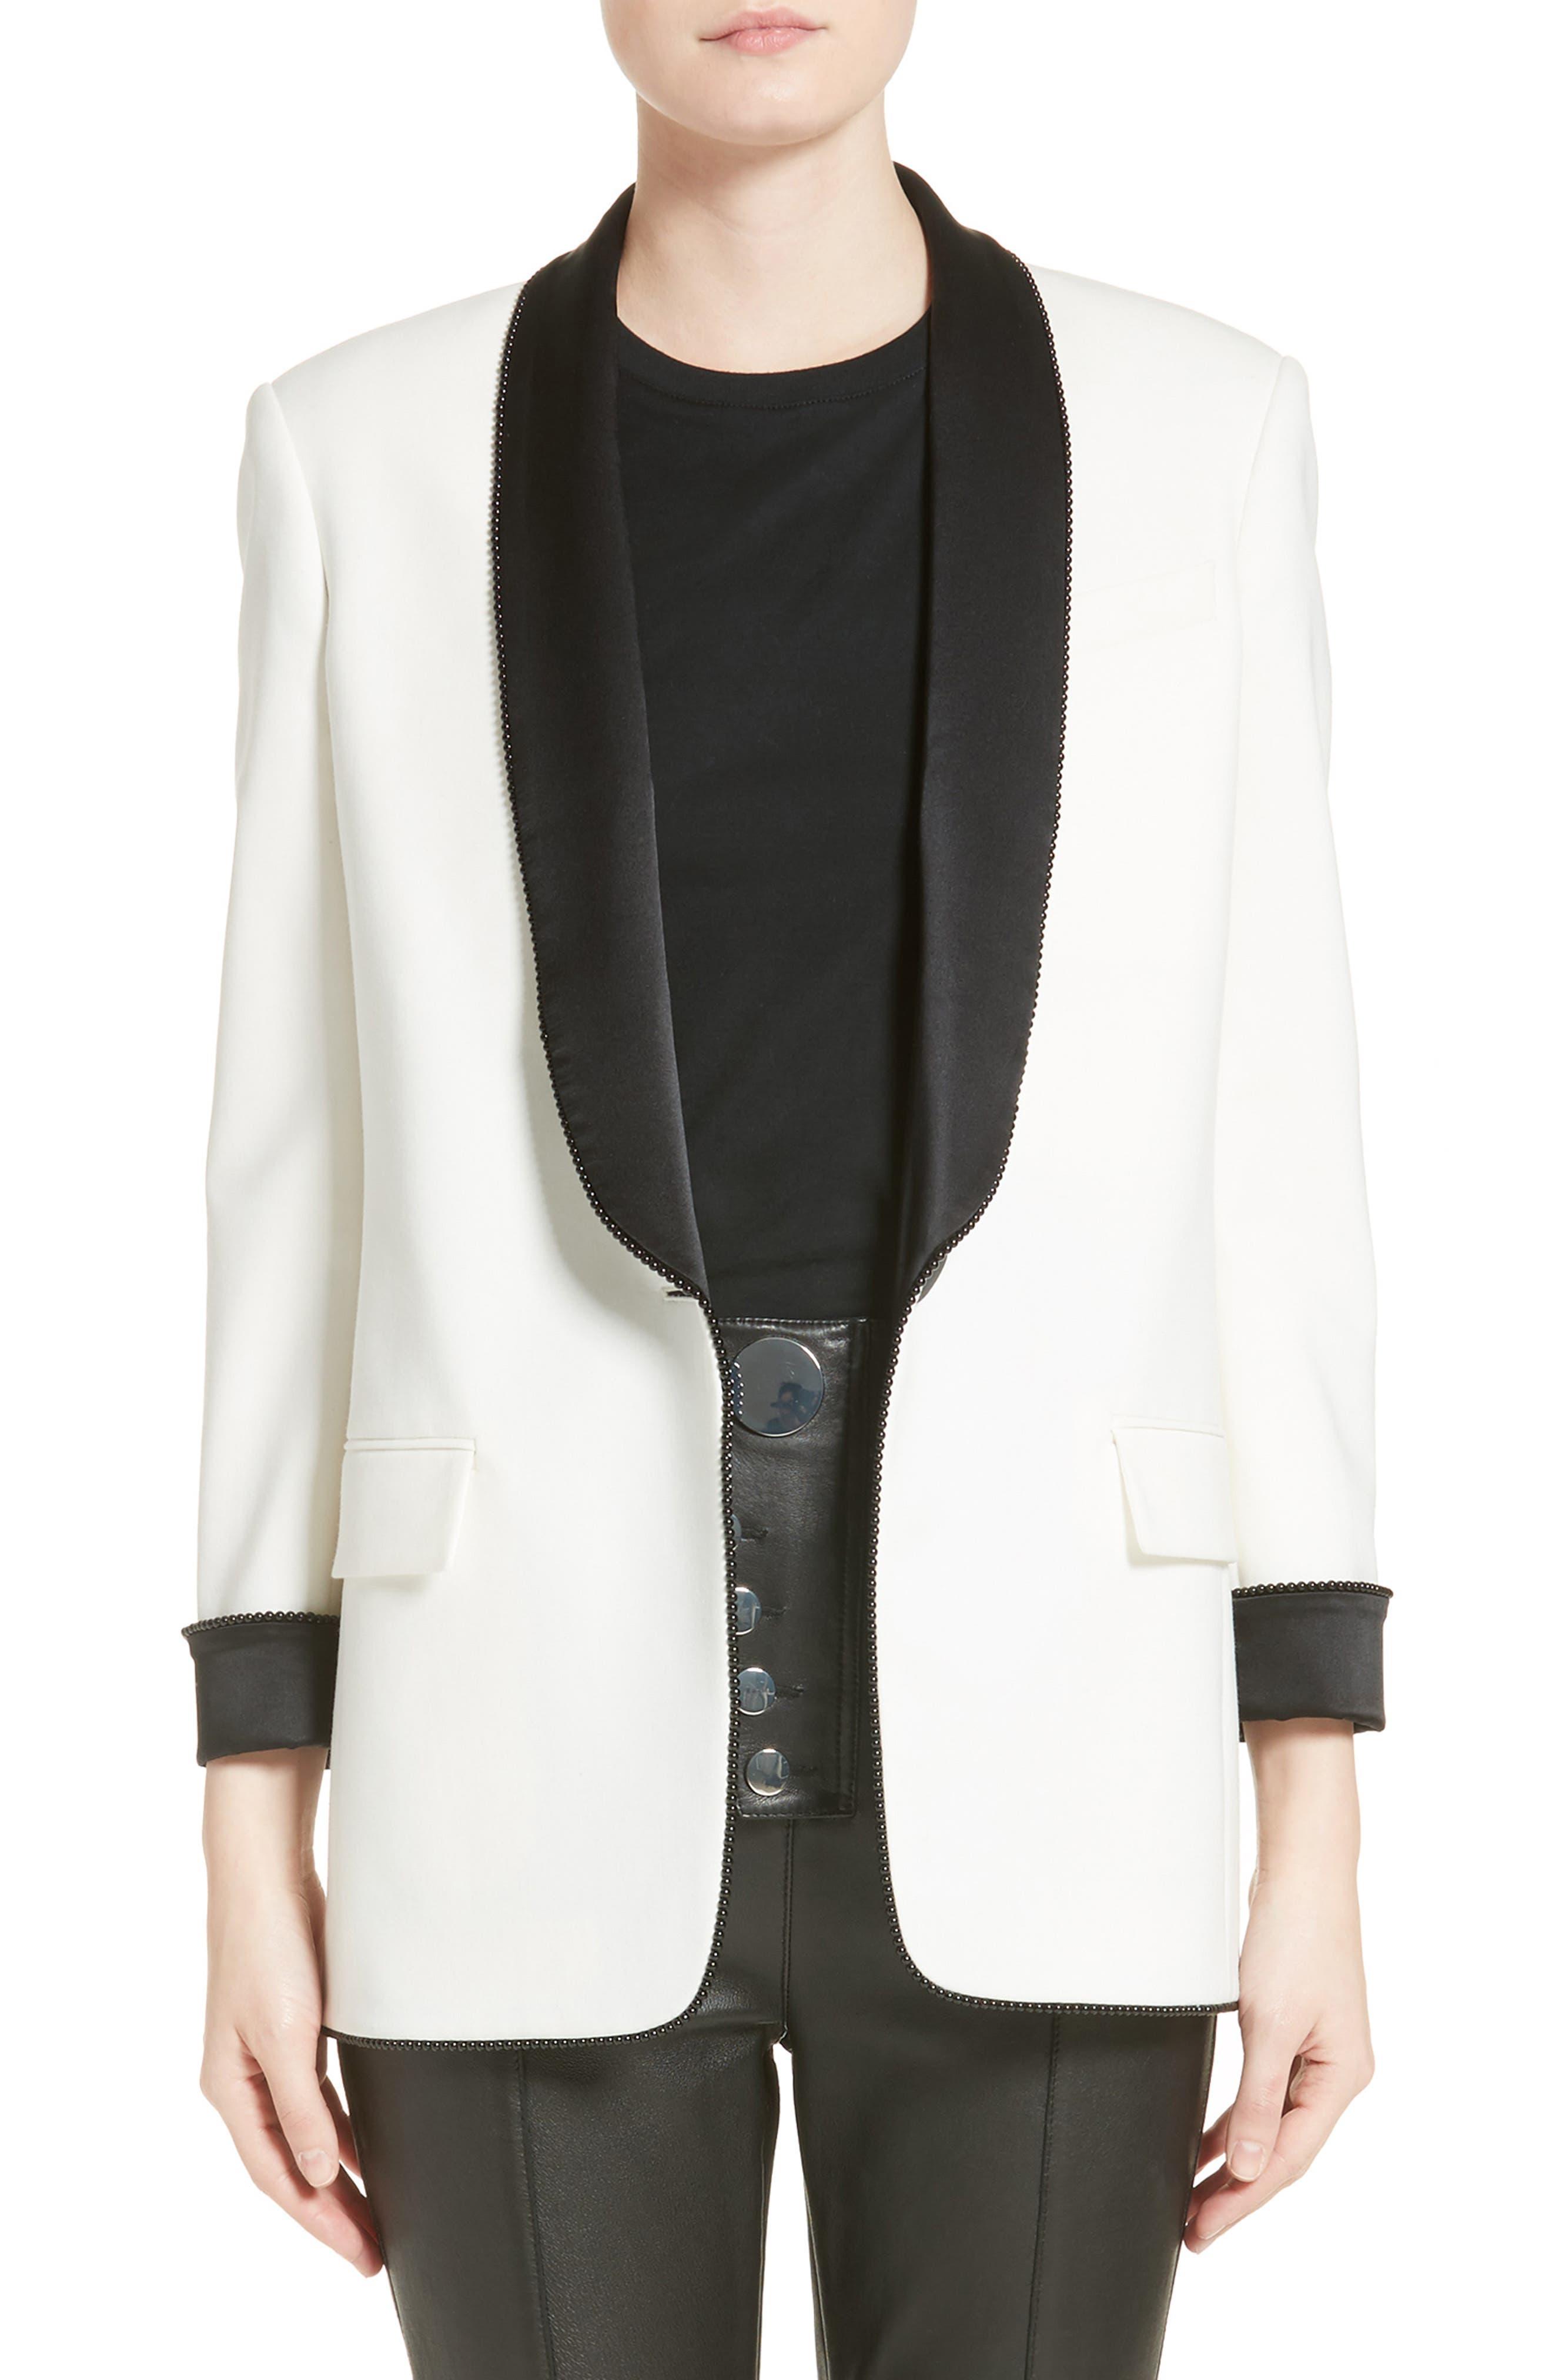 Alexander Wang Chain Trim Tuxedo Blazer